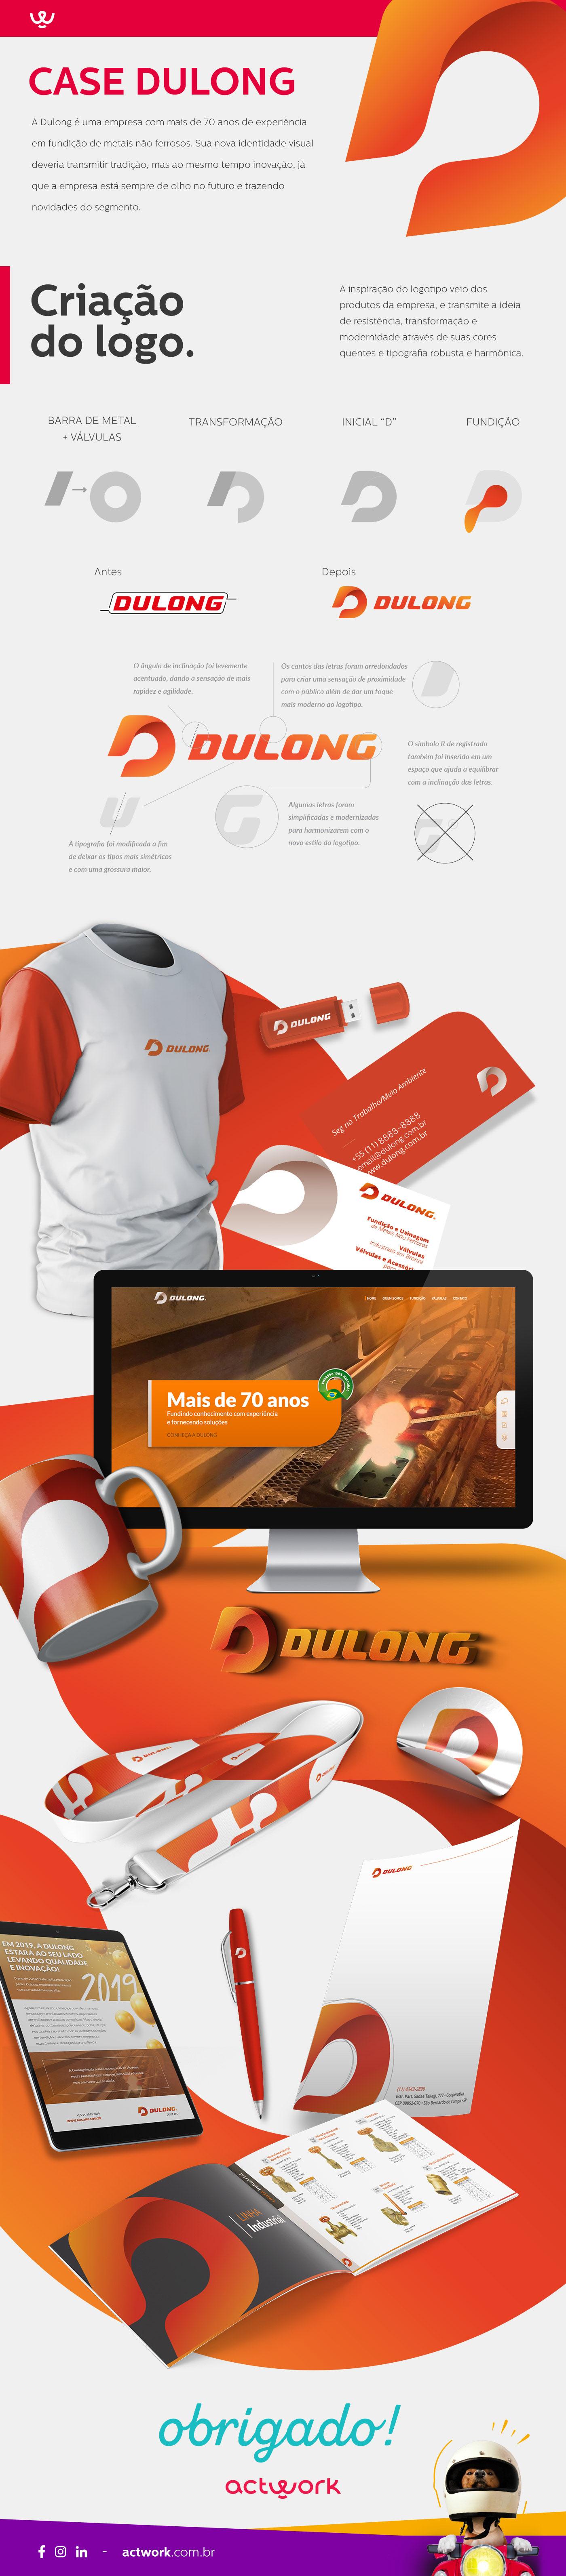 branding  marketing digital identidade visual marca marketing de performance agencia de marketing empresa de marketing agência de comunicação agencia de publicidade marketing